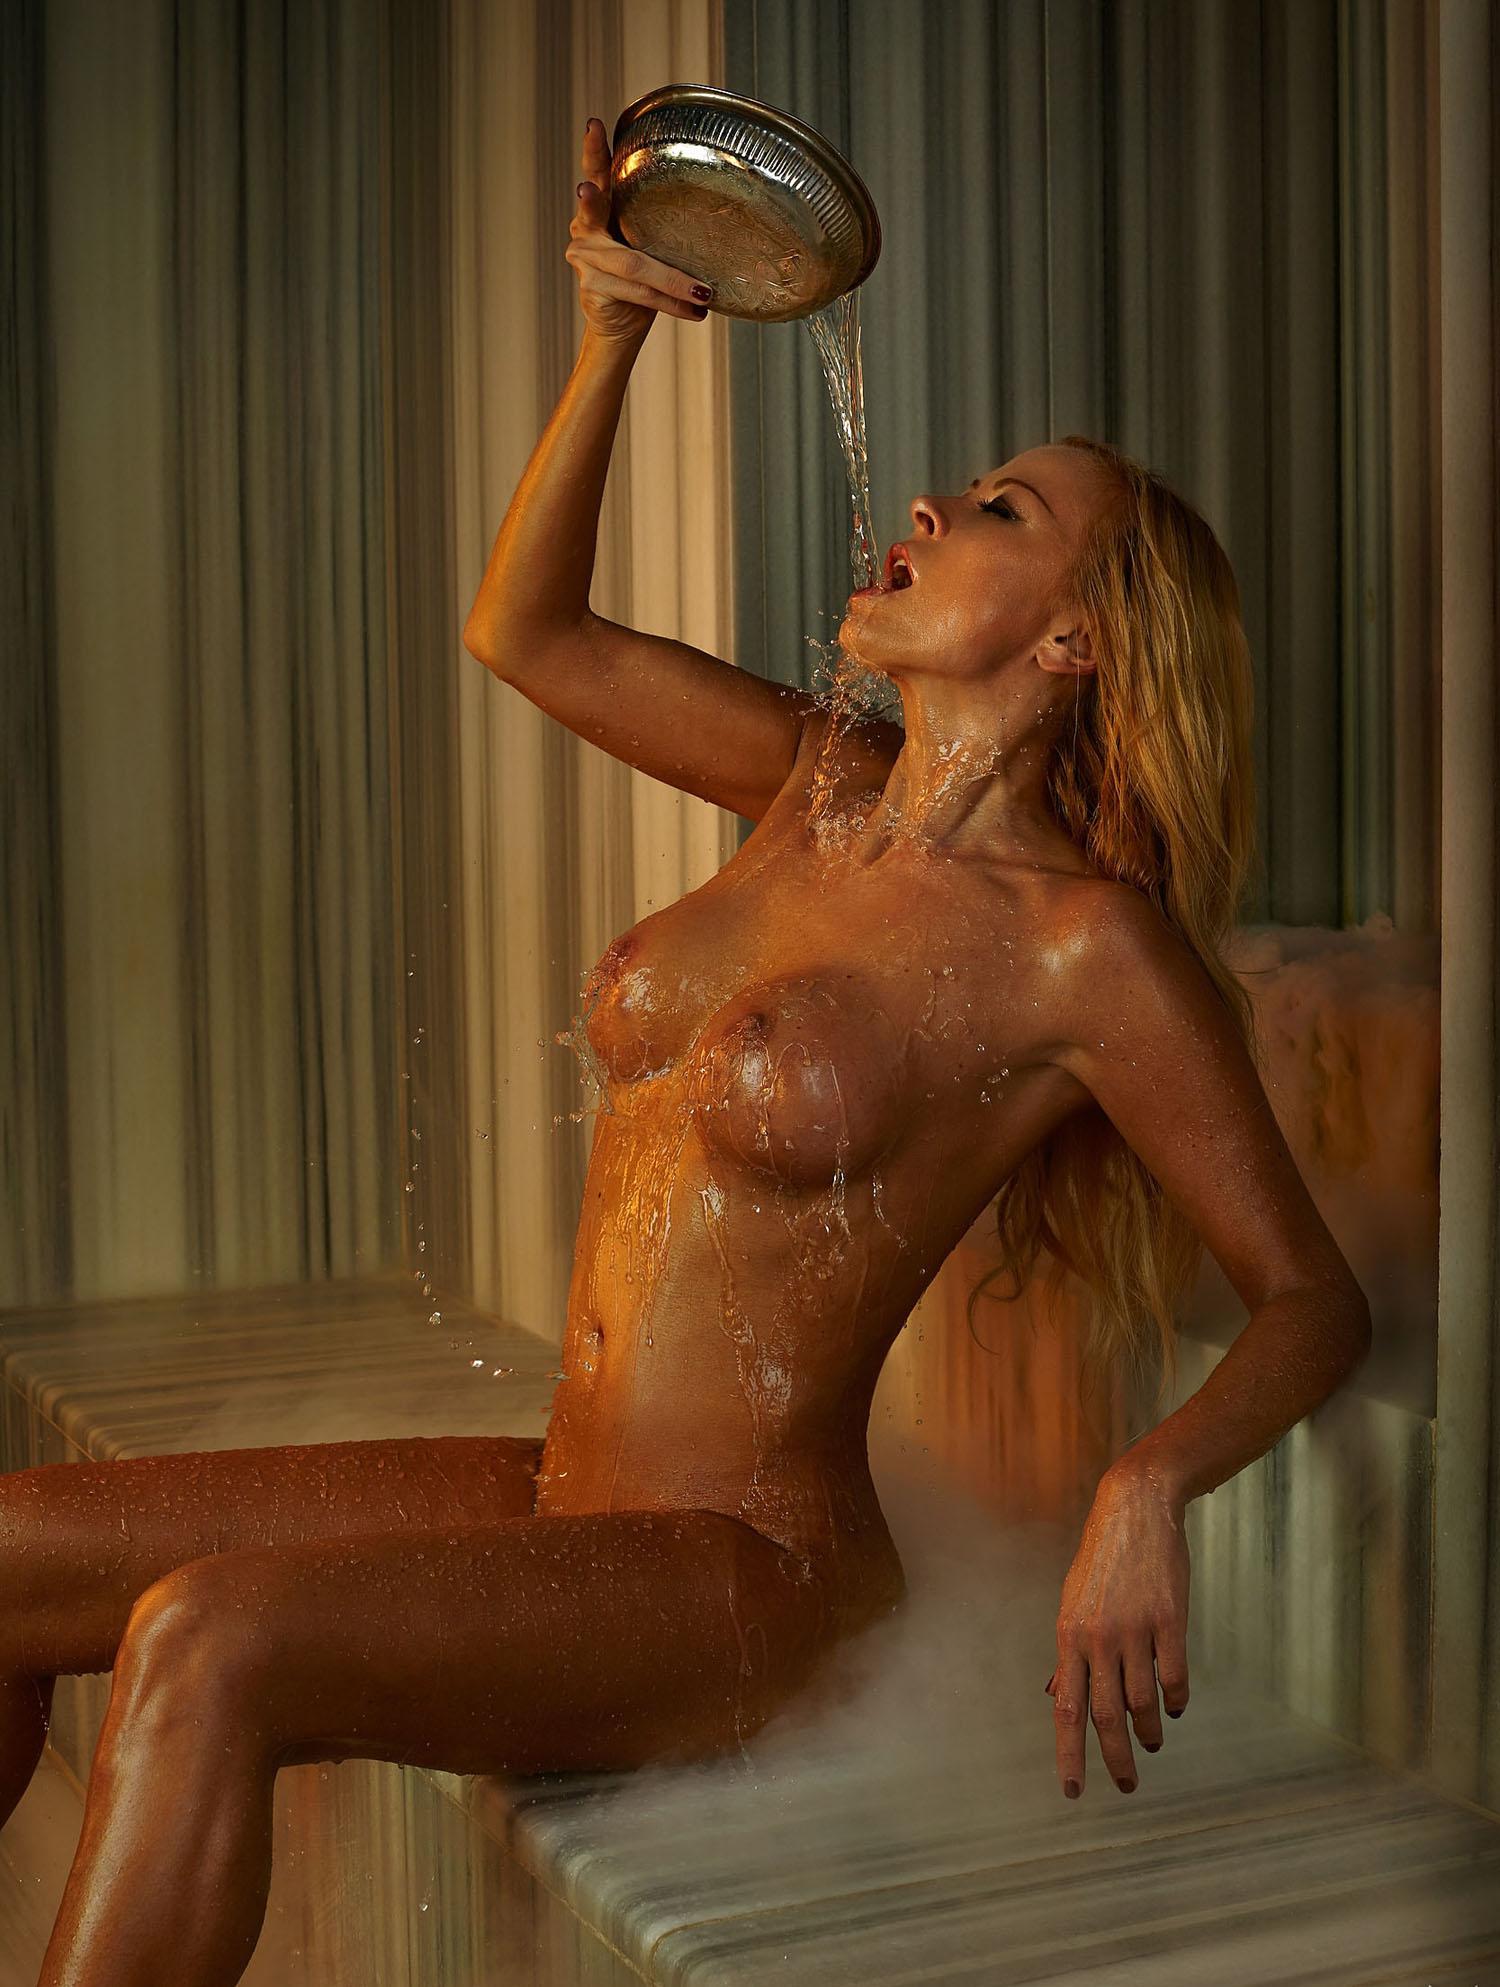 Дженни Элверс голая. Фото - 36